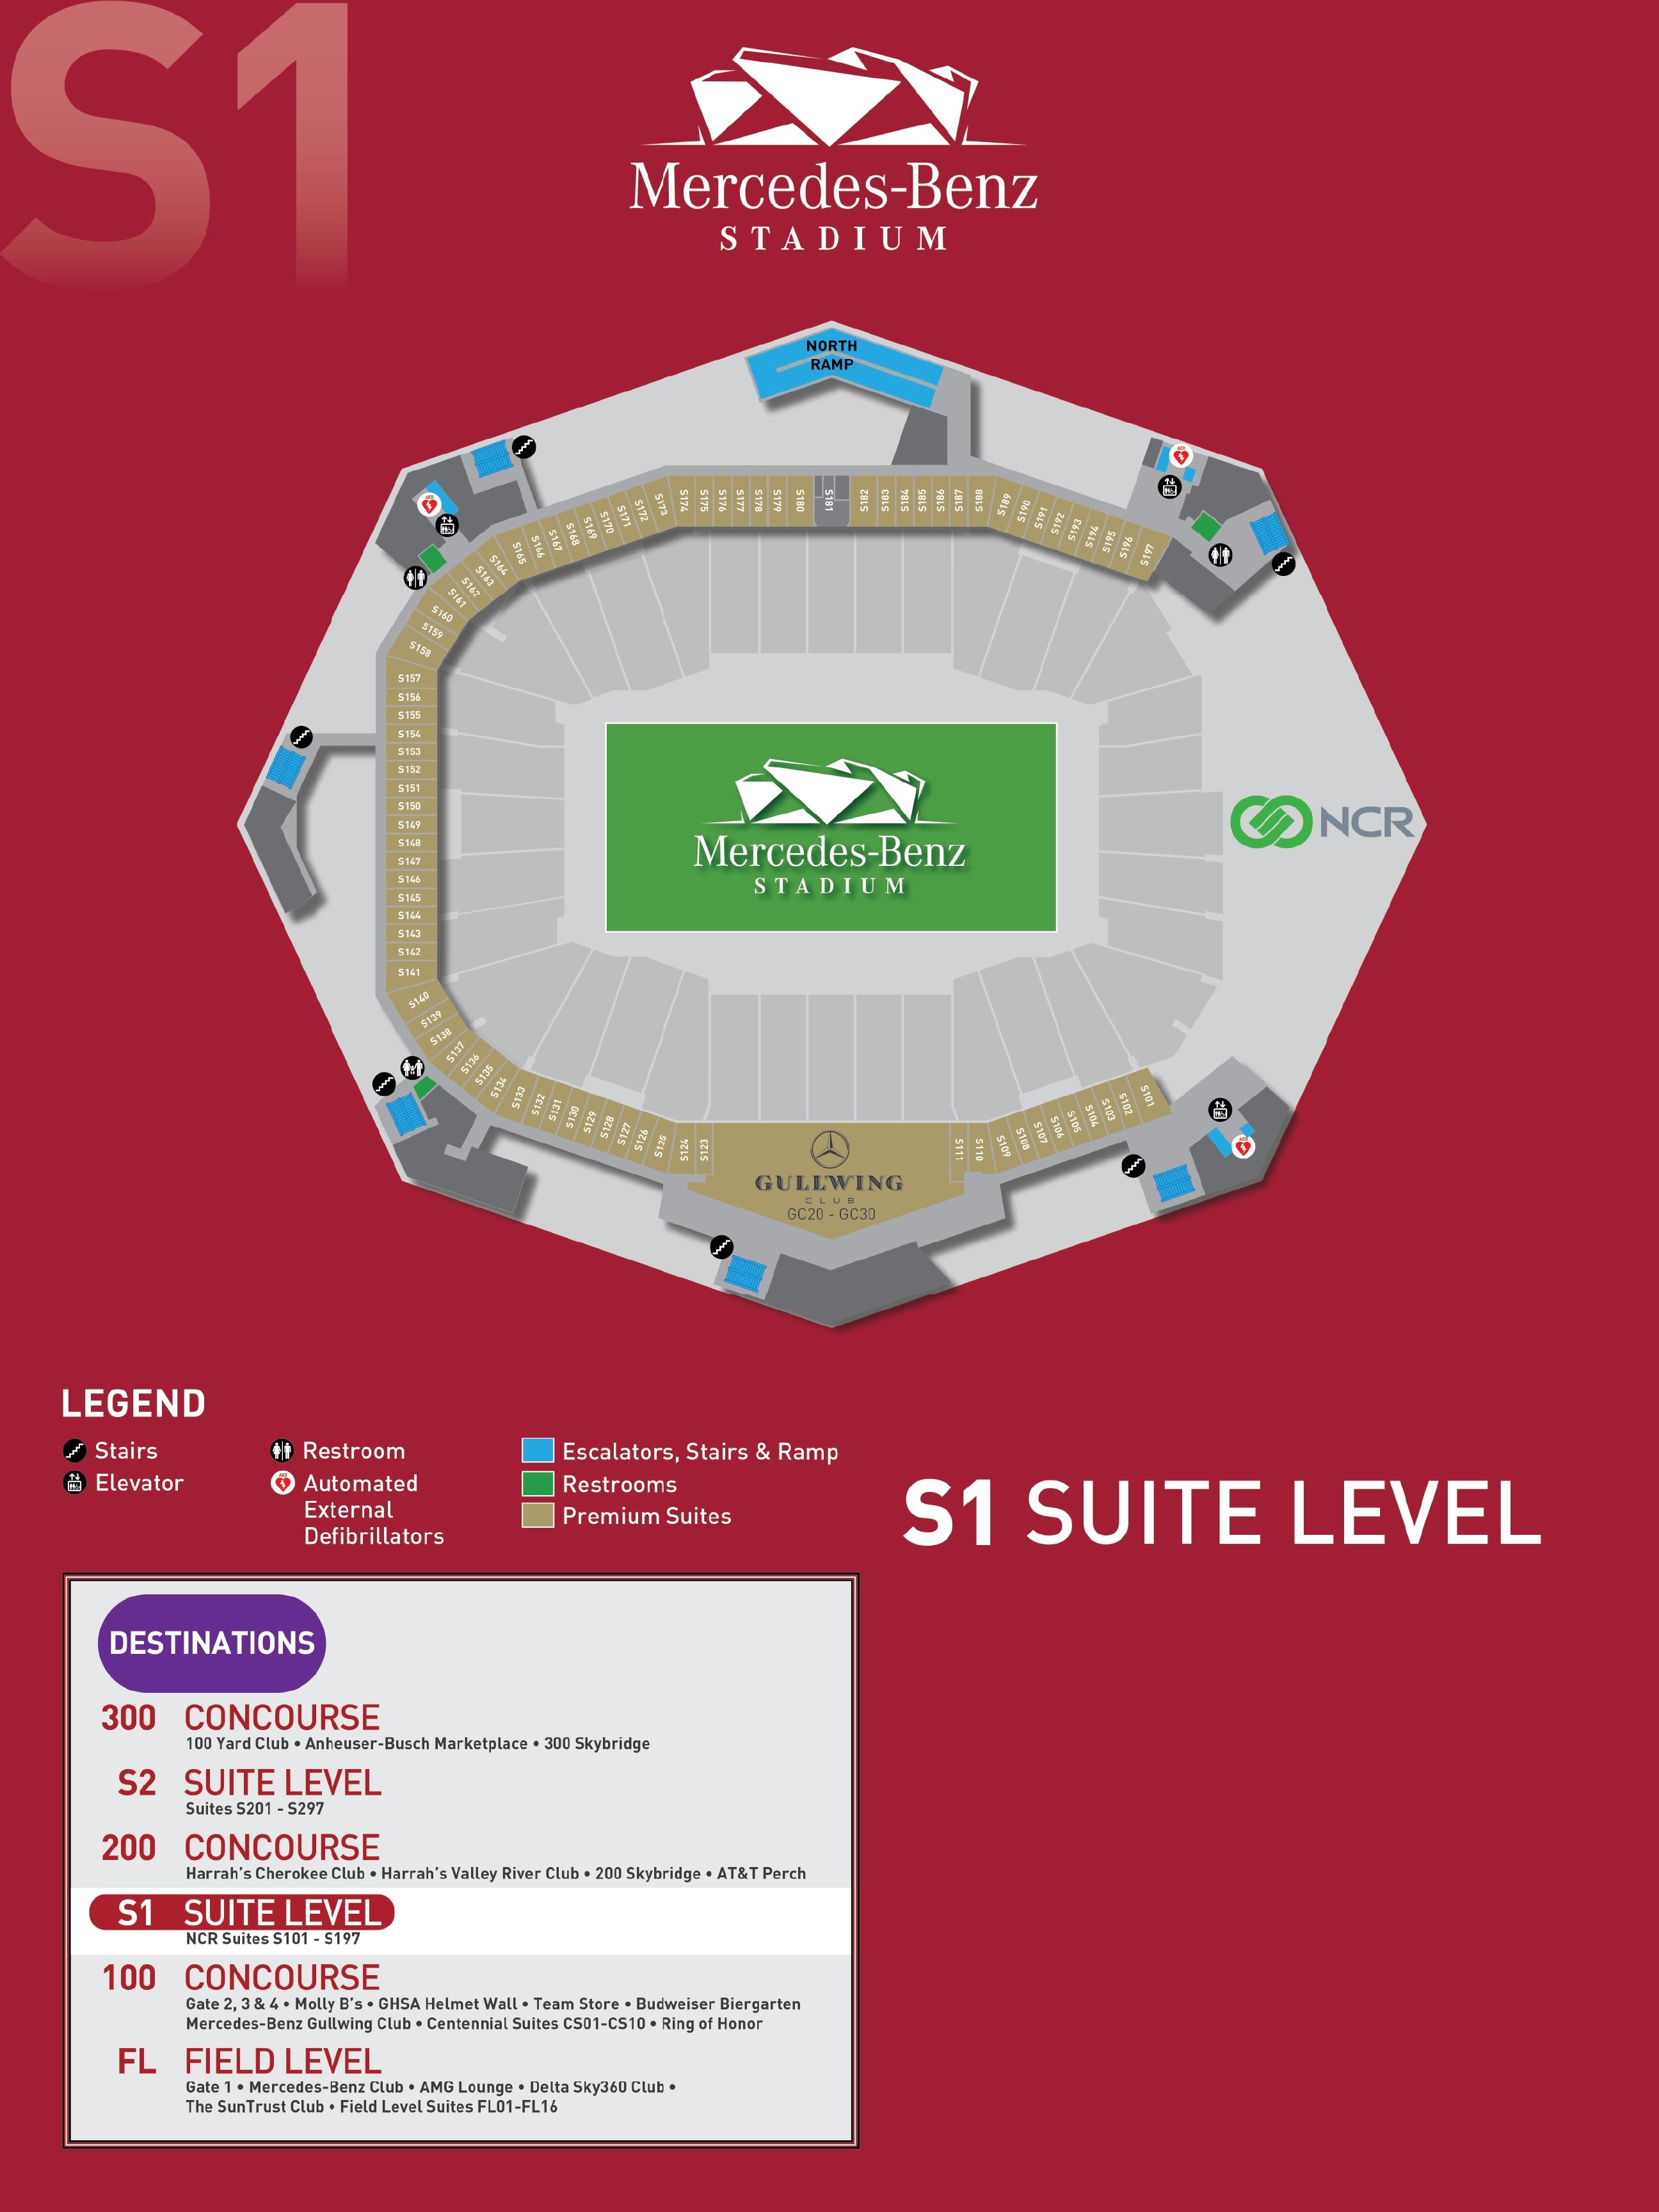 Stadium Maps - Mercedes Benz Stadium with Mercedes Benz Stadium Seating Chart For Super Bowl